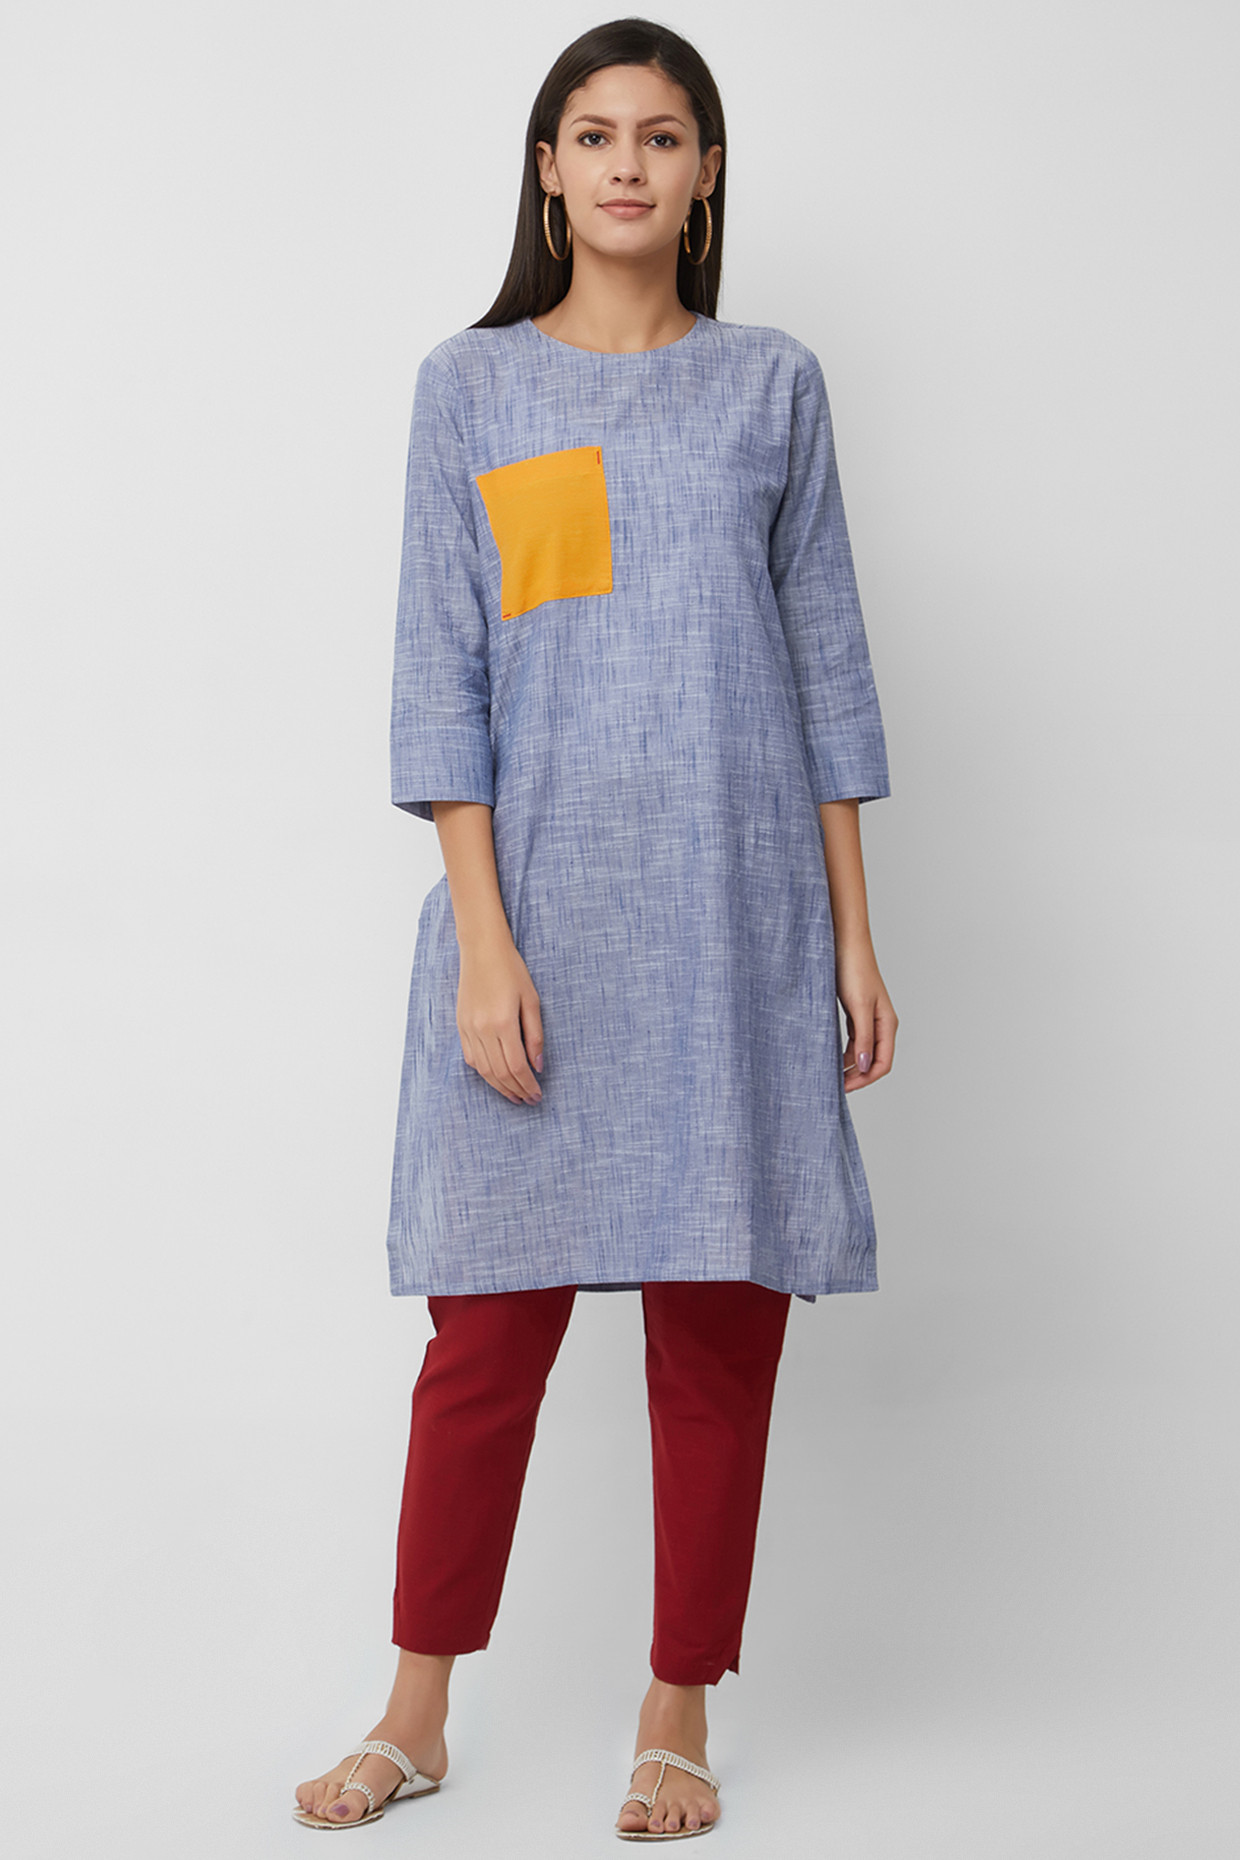 Textured Blue Kurti In Handloom Cotton by House Of Idar